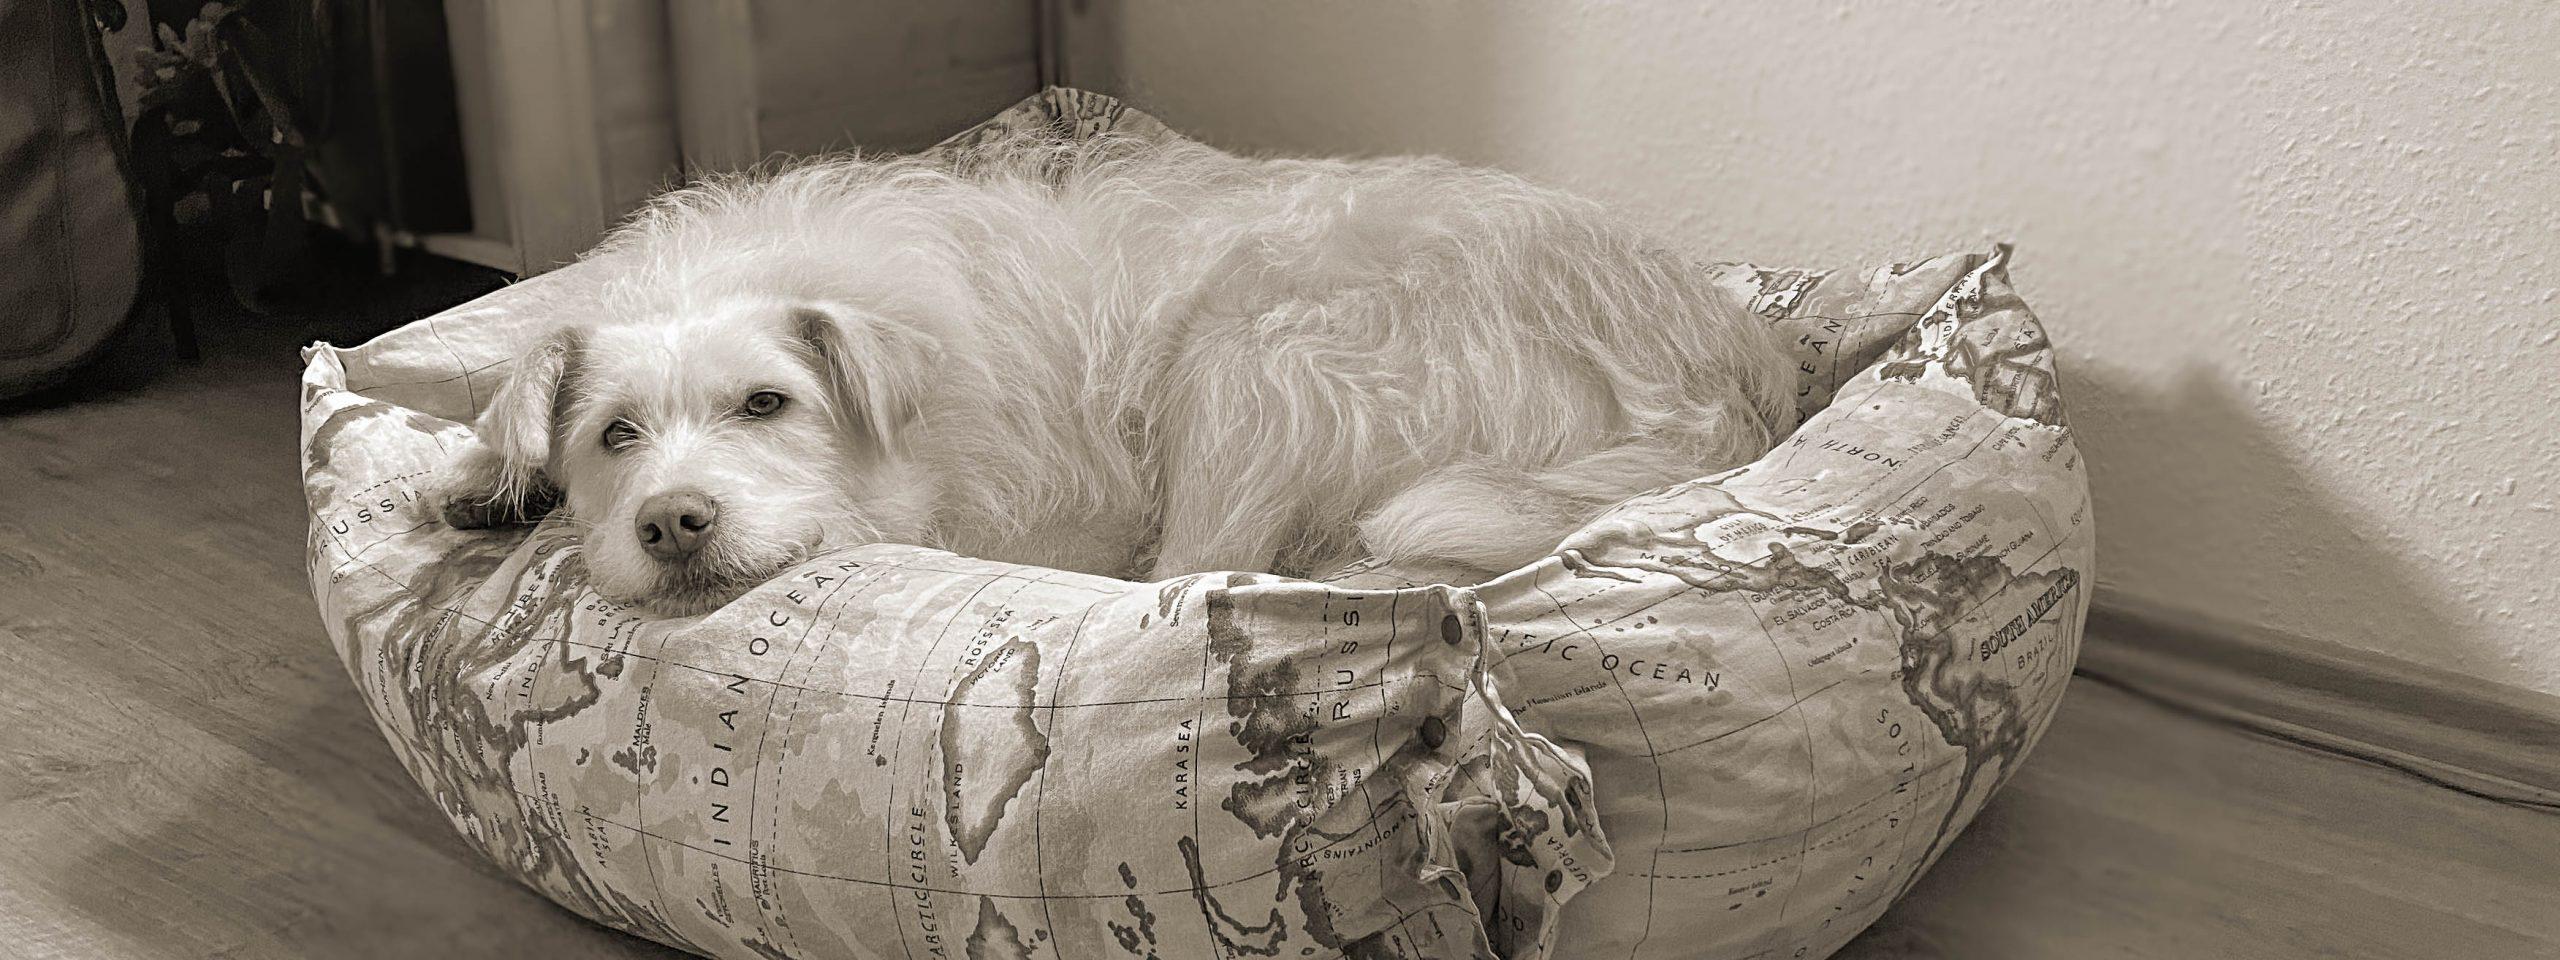 Hund liegt im Hundebett